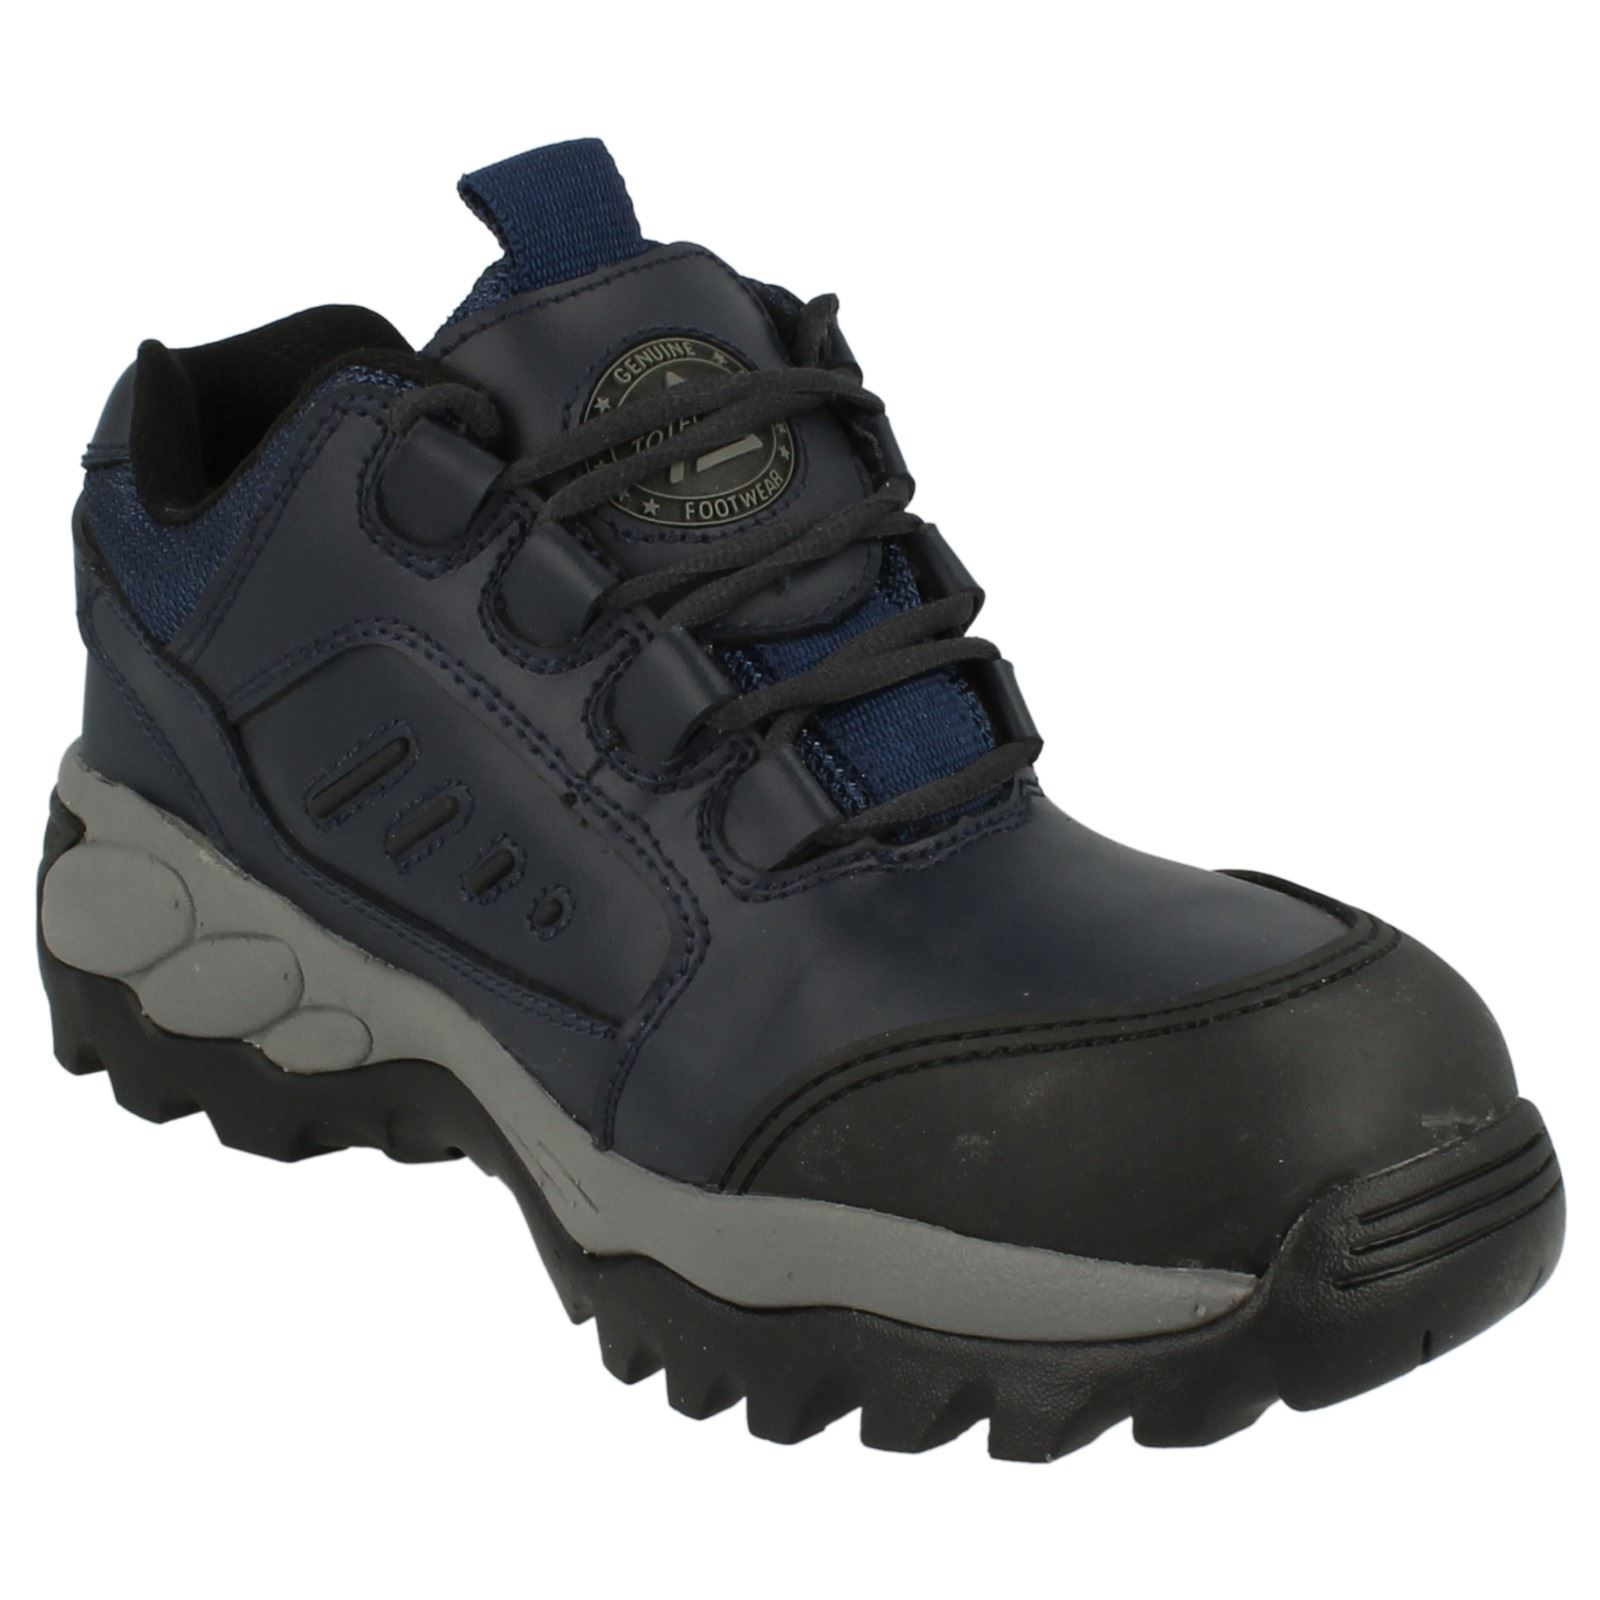 steel toe sport shoes 28 images mens safety sport